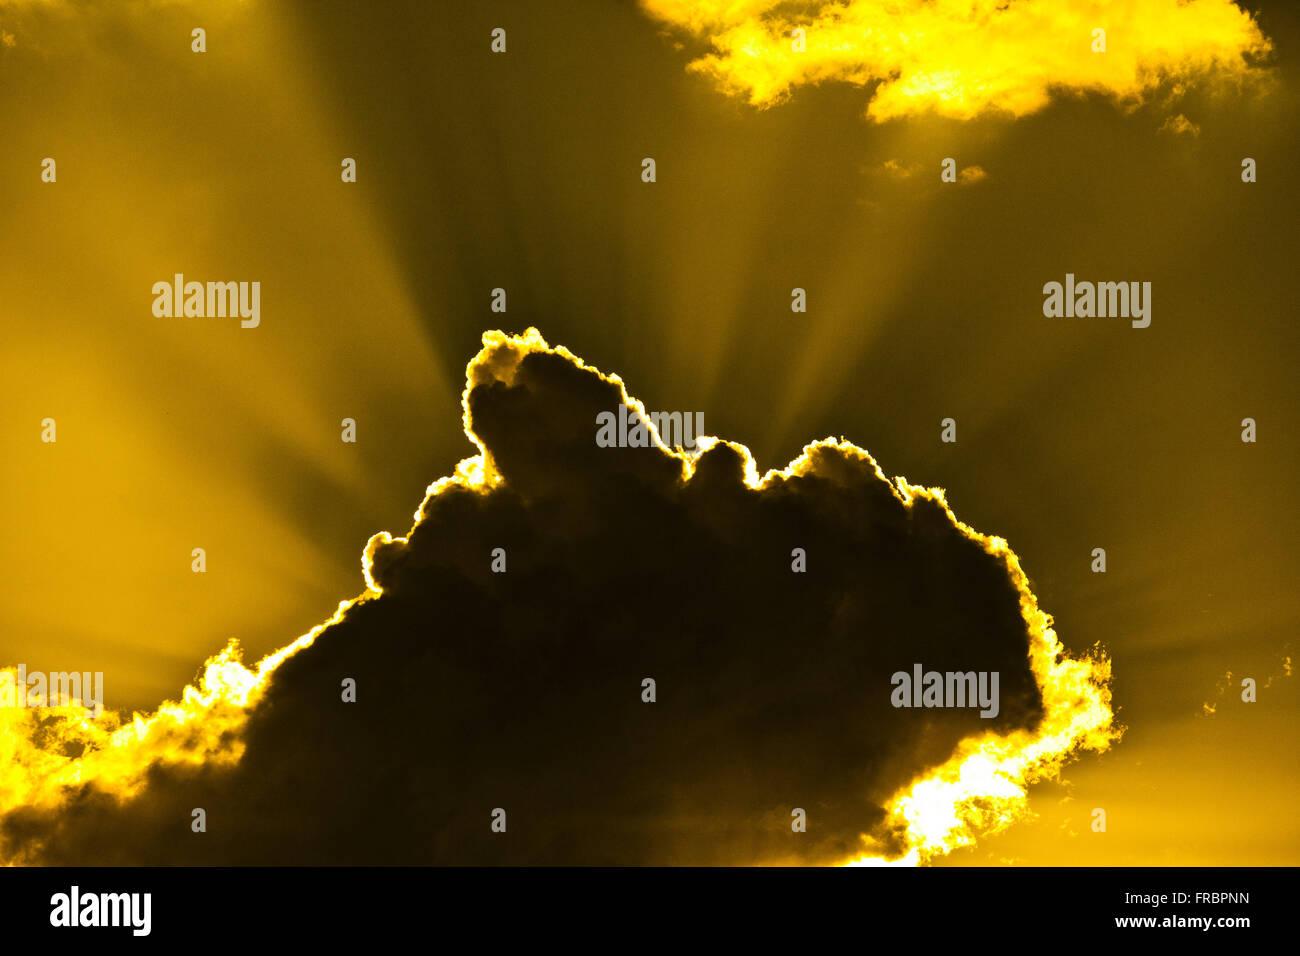 Rain cloud and sunset - Stock Image